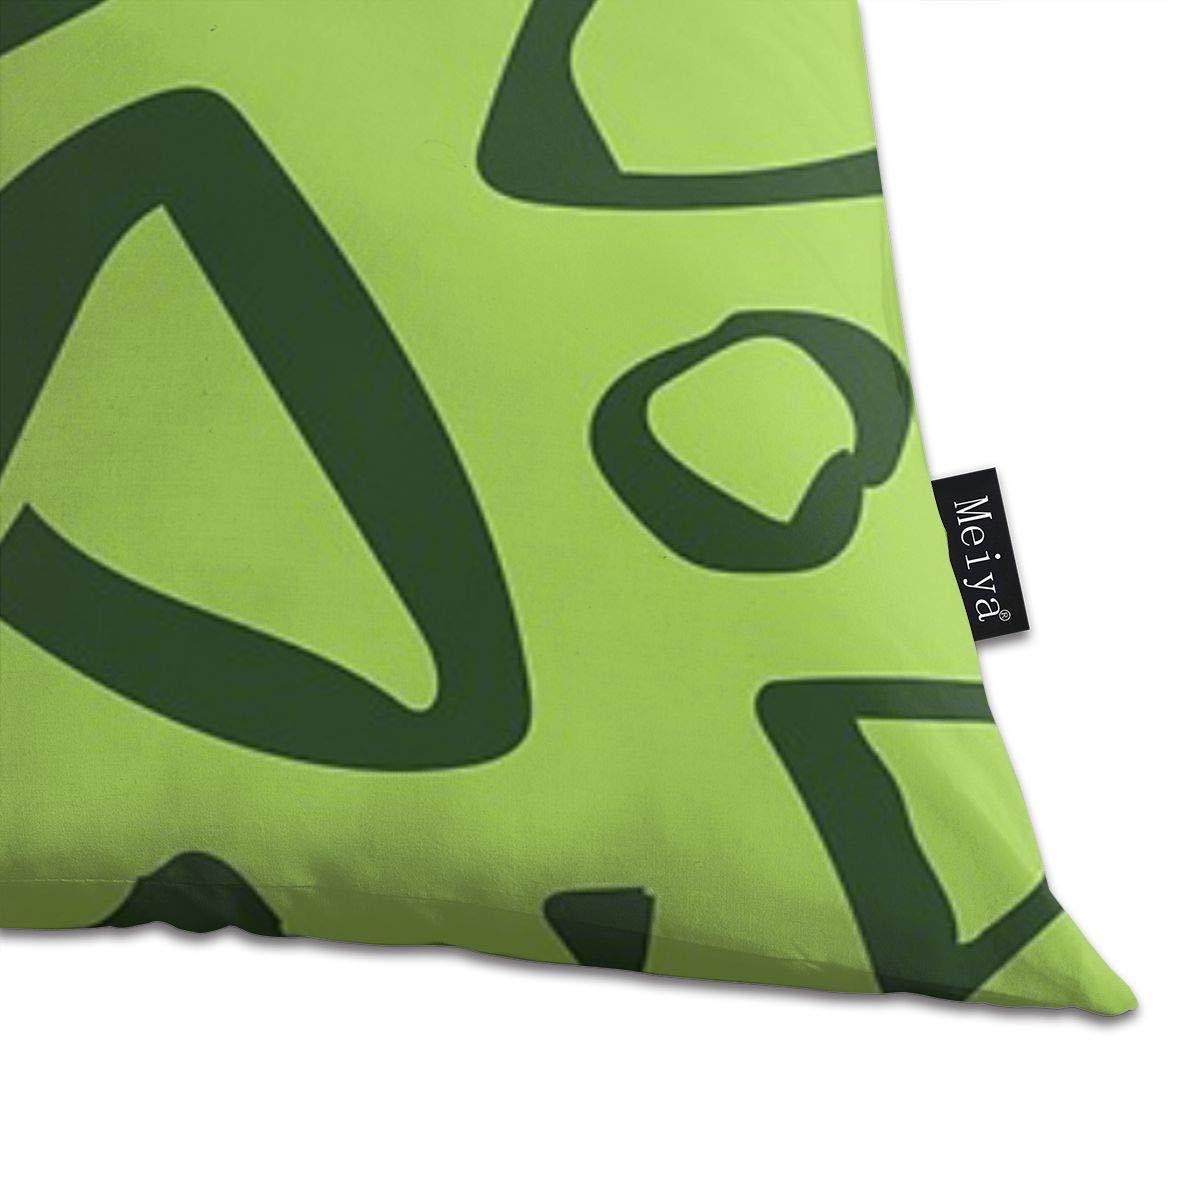 Cosplay Decorative Pillow Case Home Decor Square 18x18 Inches Pillowcase QMS CONTRACTING LIMITED Throw Pillow Cover Nanatsu No Taizai King